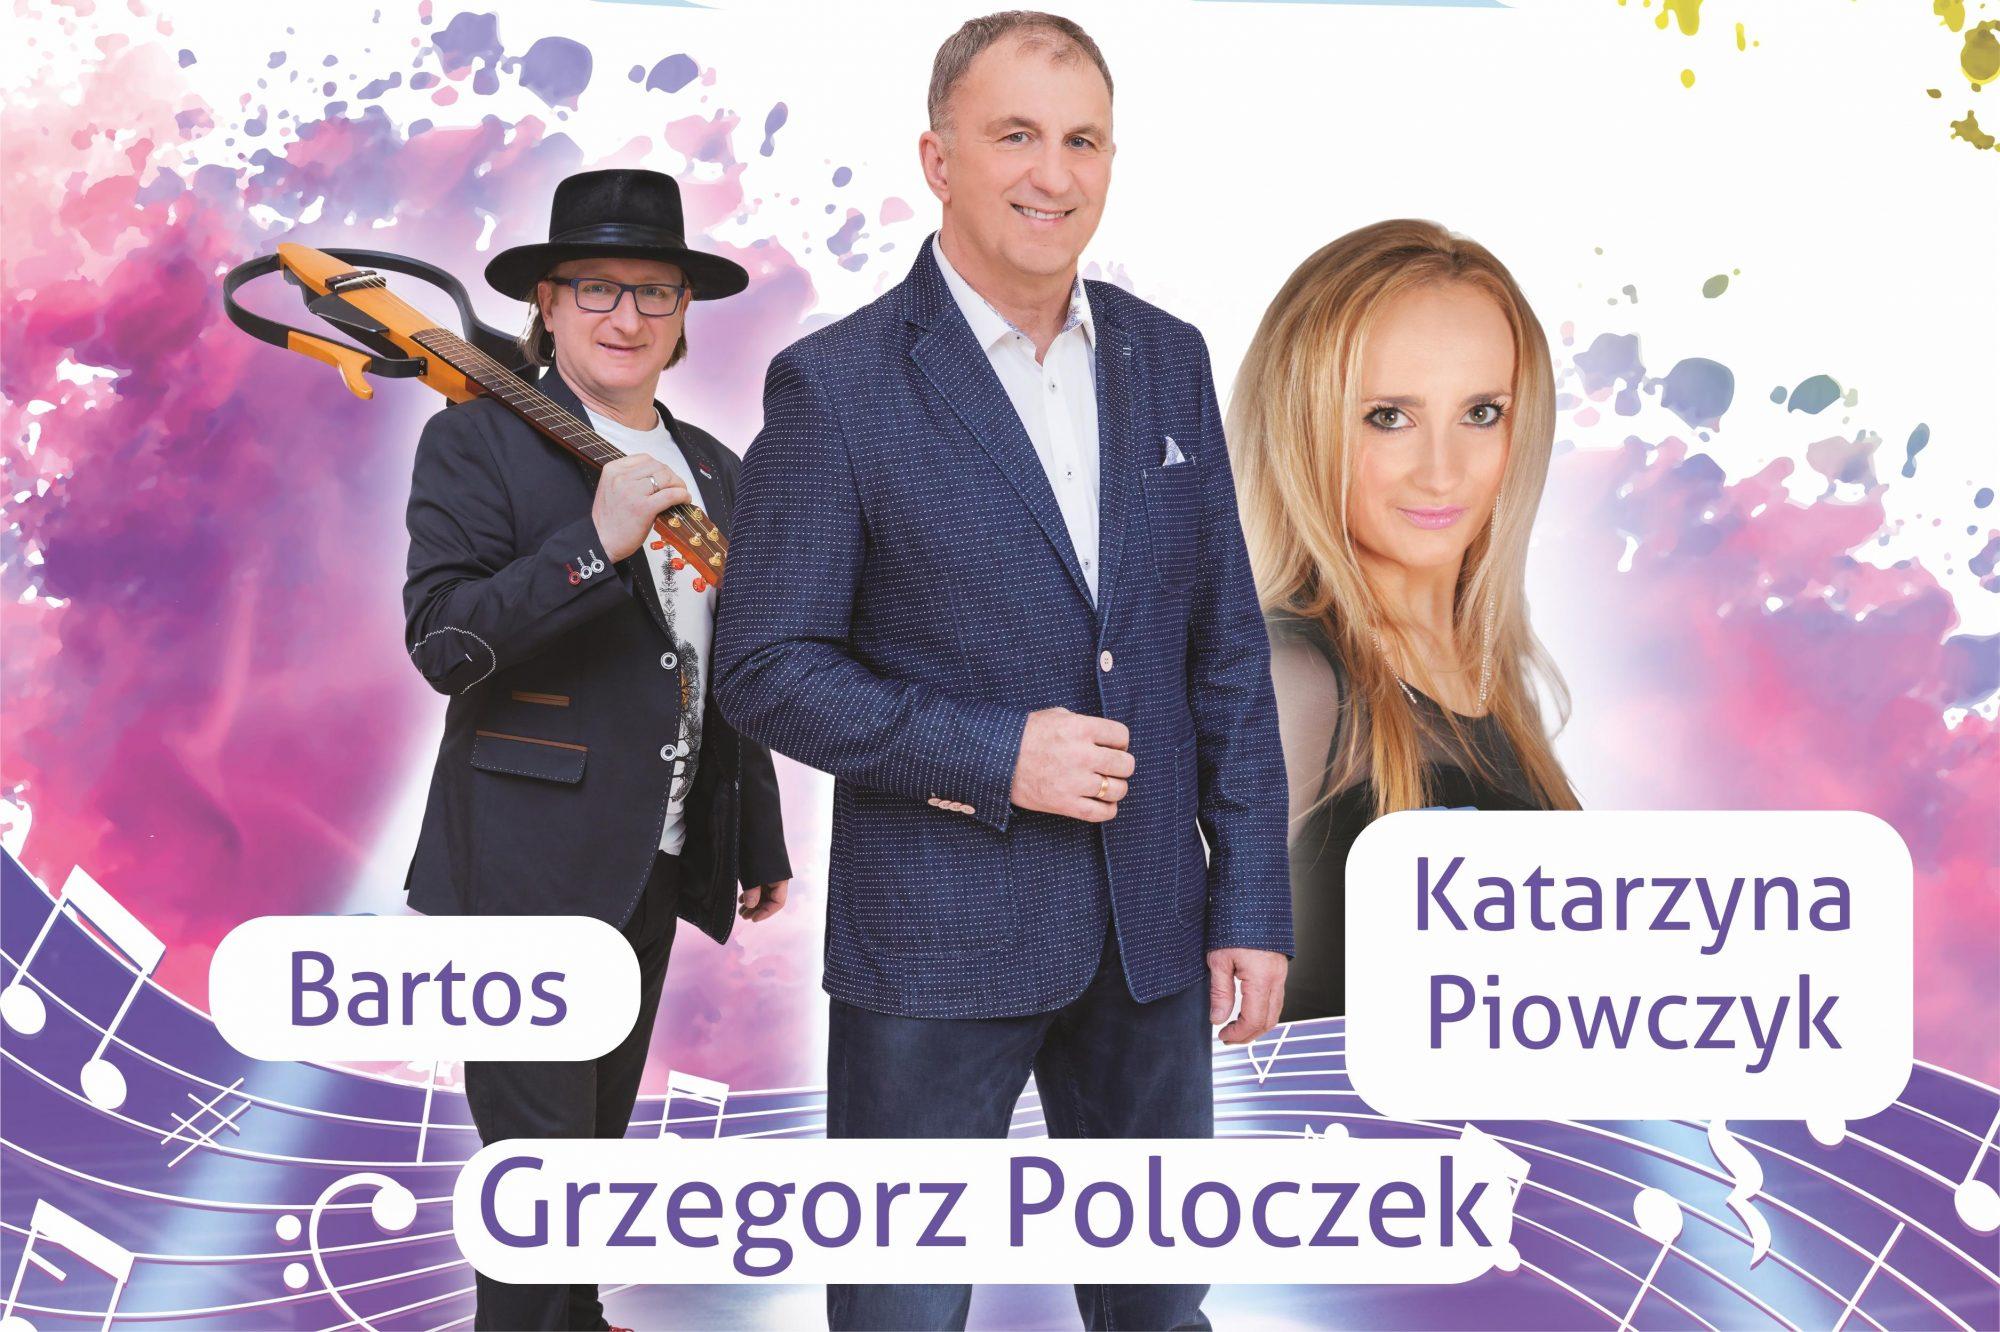 https://siemck.pl/wp-content/uploads/POLOCZEK-KONCERT-2000x1332.jpg